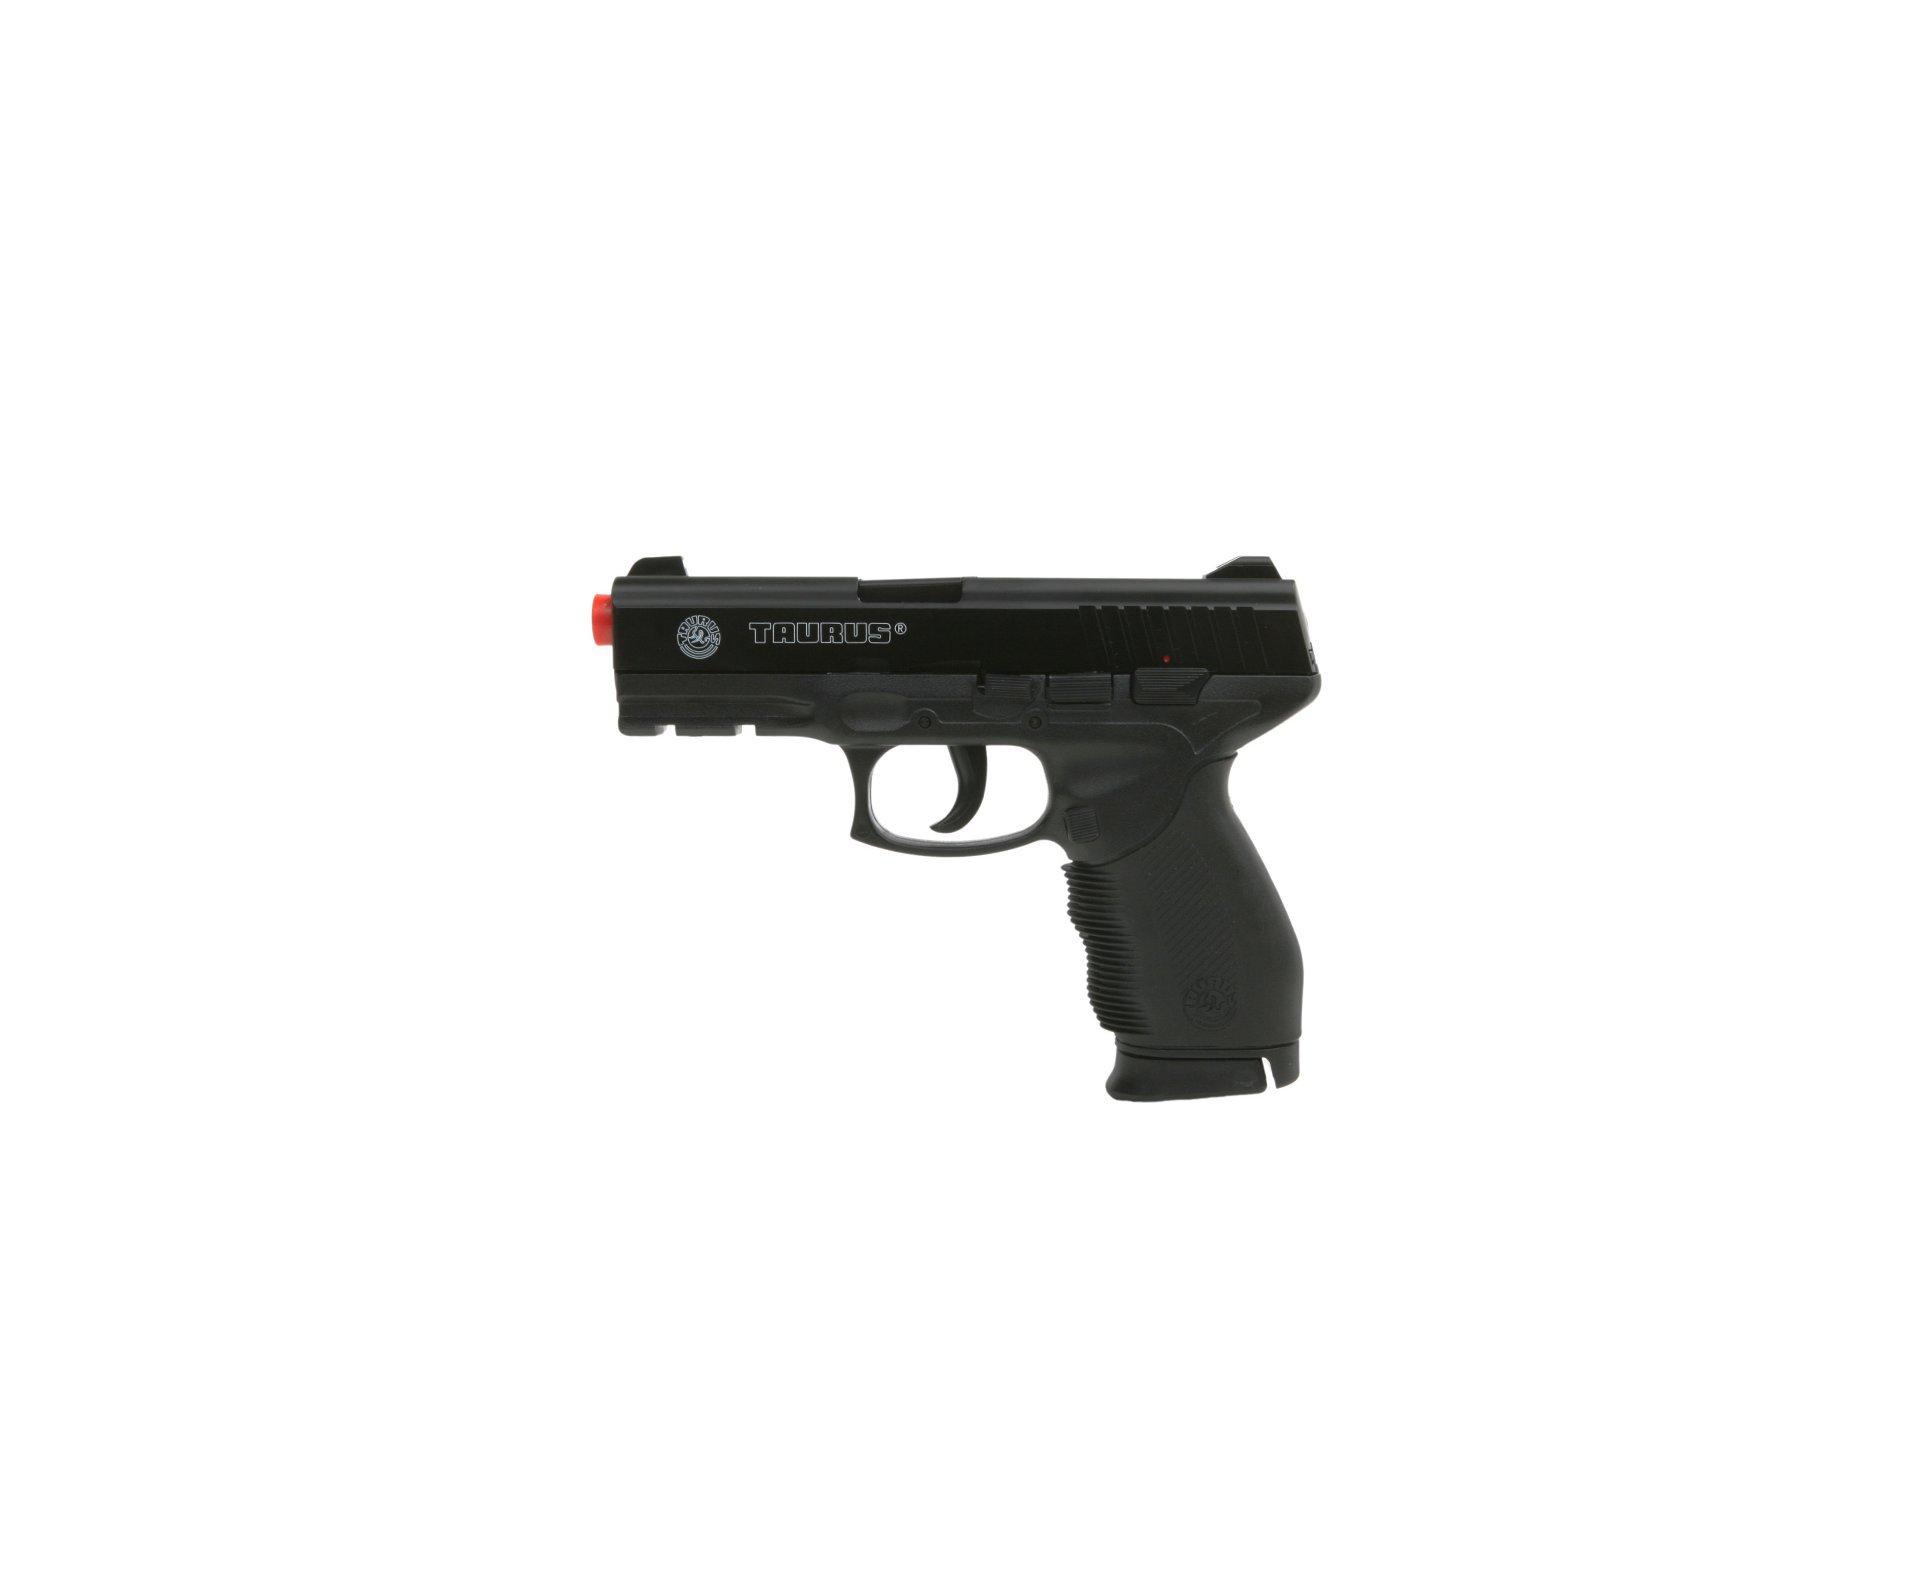 Rifle De Airsoft Colt M4a1ris Cal 6,0mm - King Arms + Pistola 24/7 Taurus